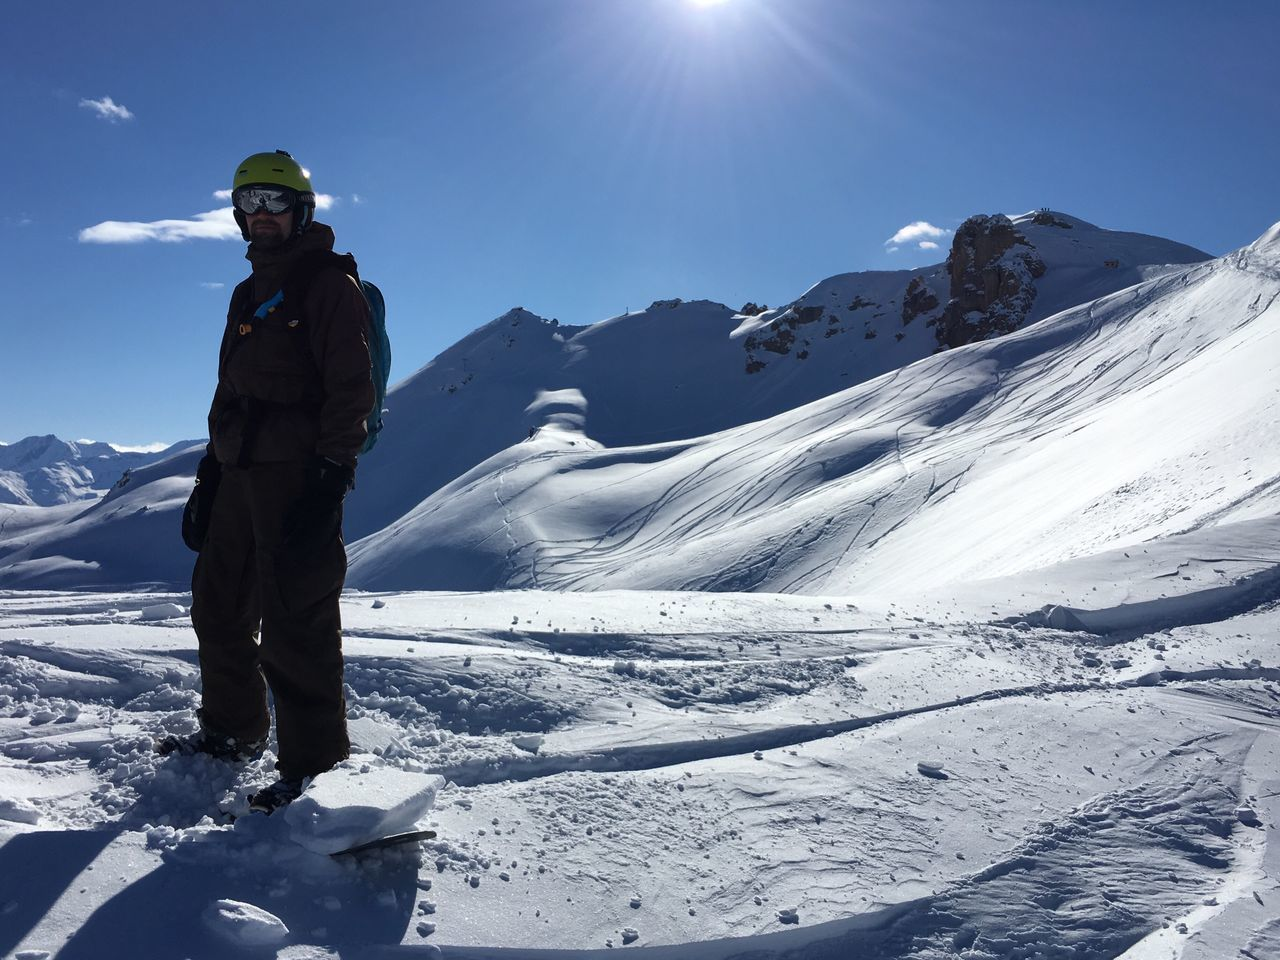 Showcase March Snowboarding Off Piste Backcountry Rider Winter Winter Wonderland Snow Portrait Gear Bluebird Day Blue Sky Tracks Mountains Alps Serre Chevalier